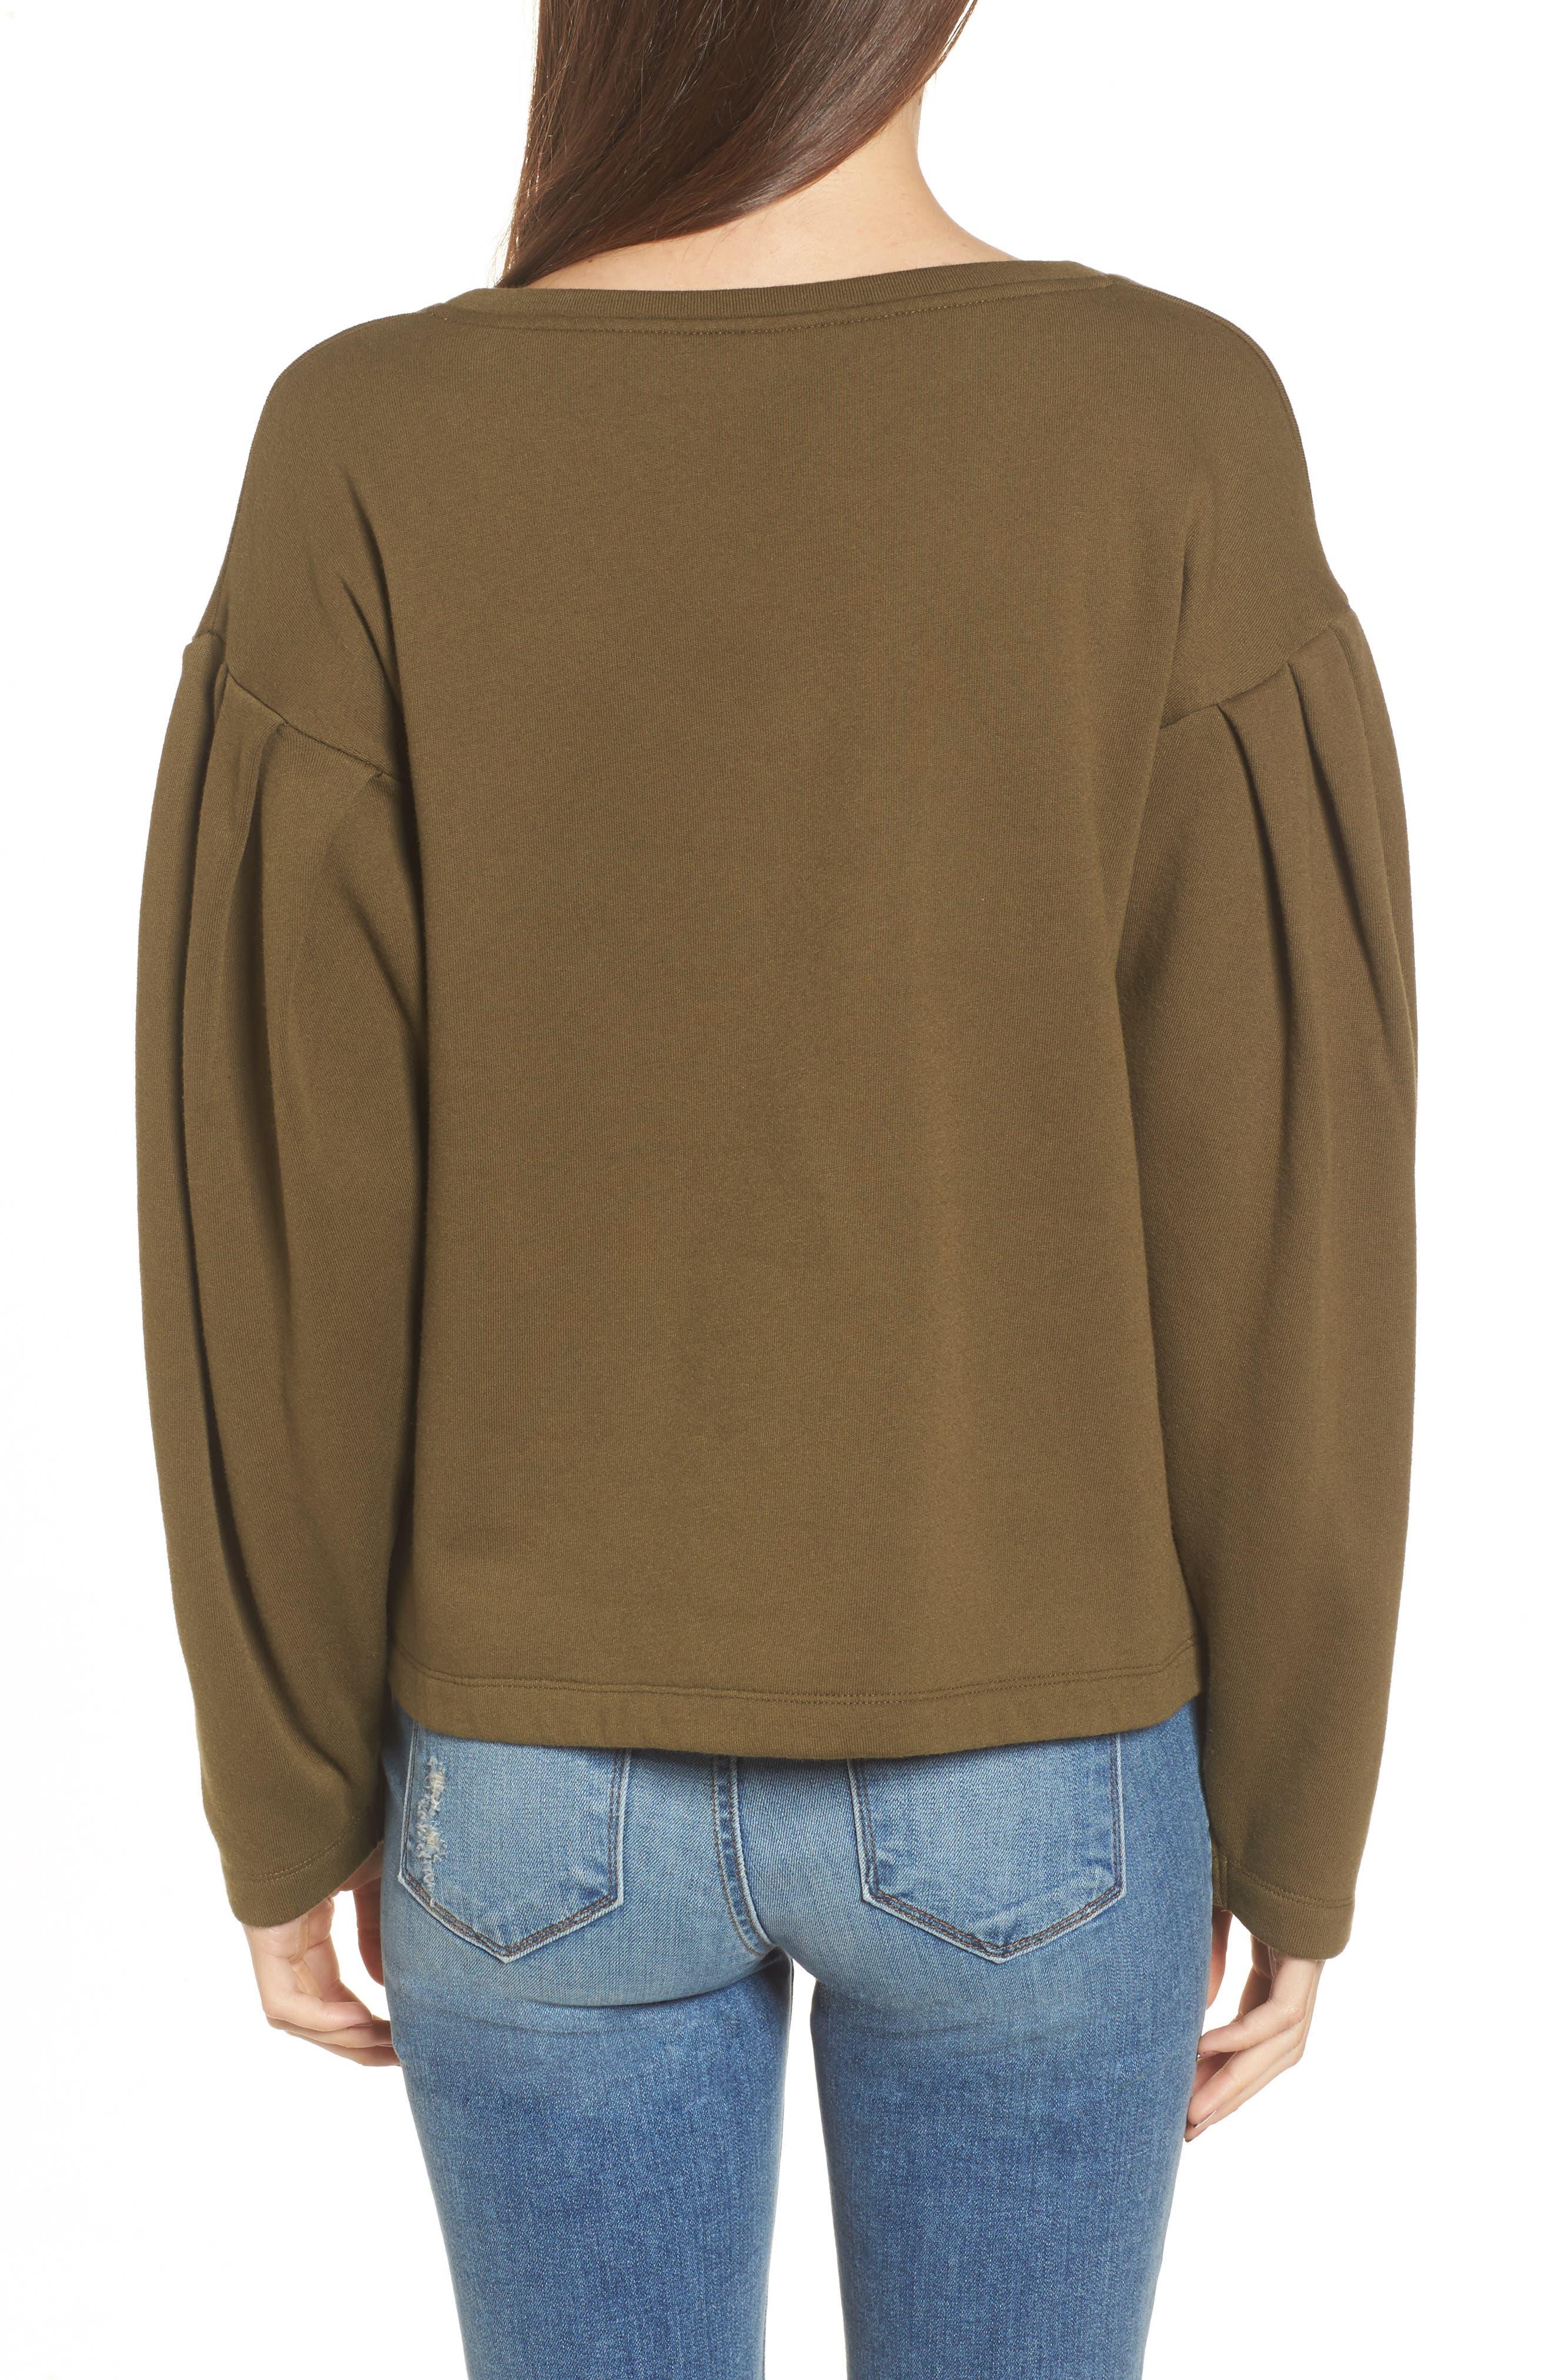 Pleat Sleeve Sweater,                             Alternate thumbnail 2, color,                             311